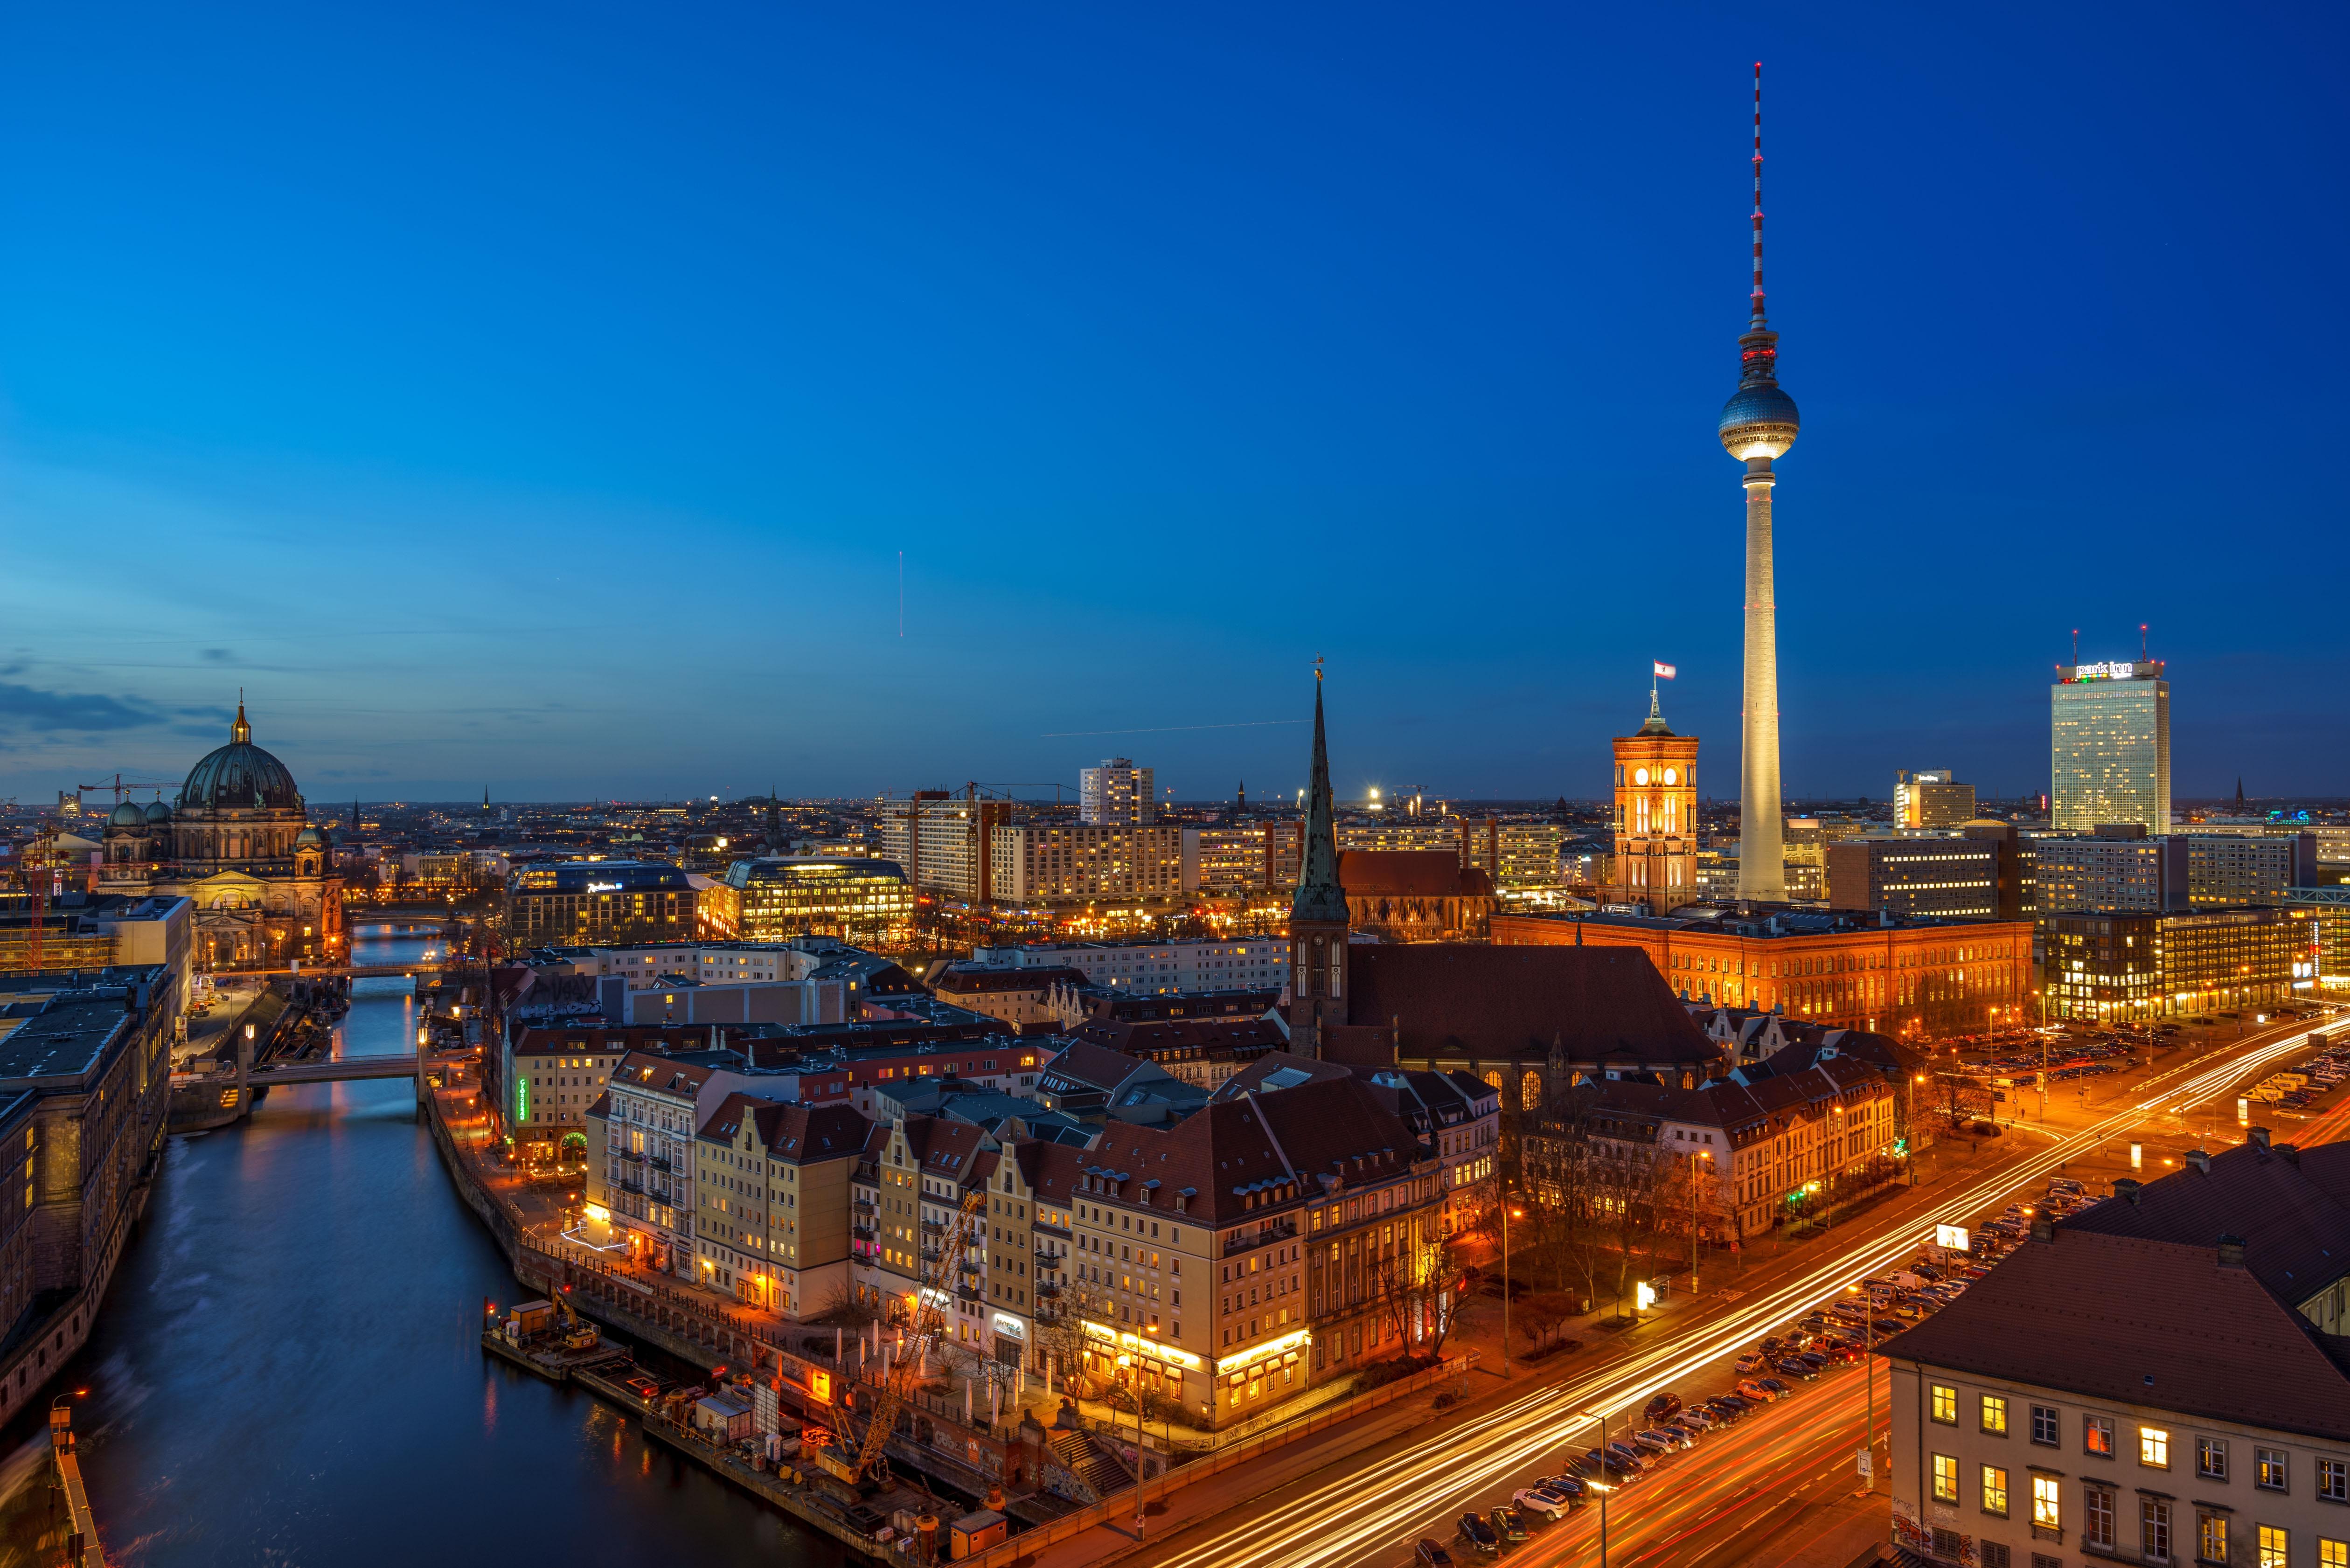 Транспорт. Берлин